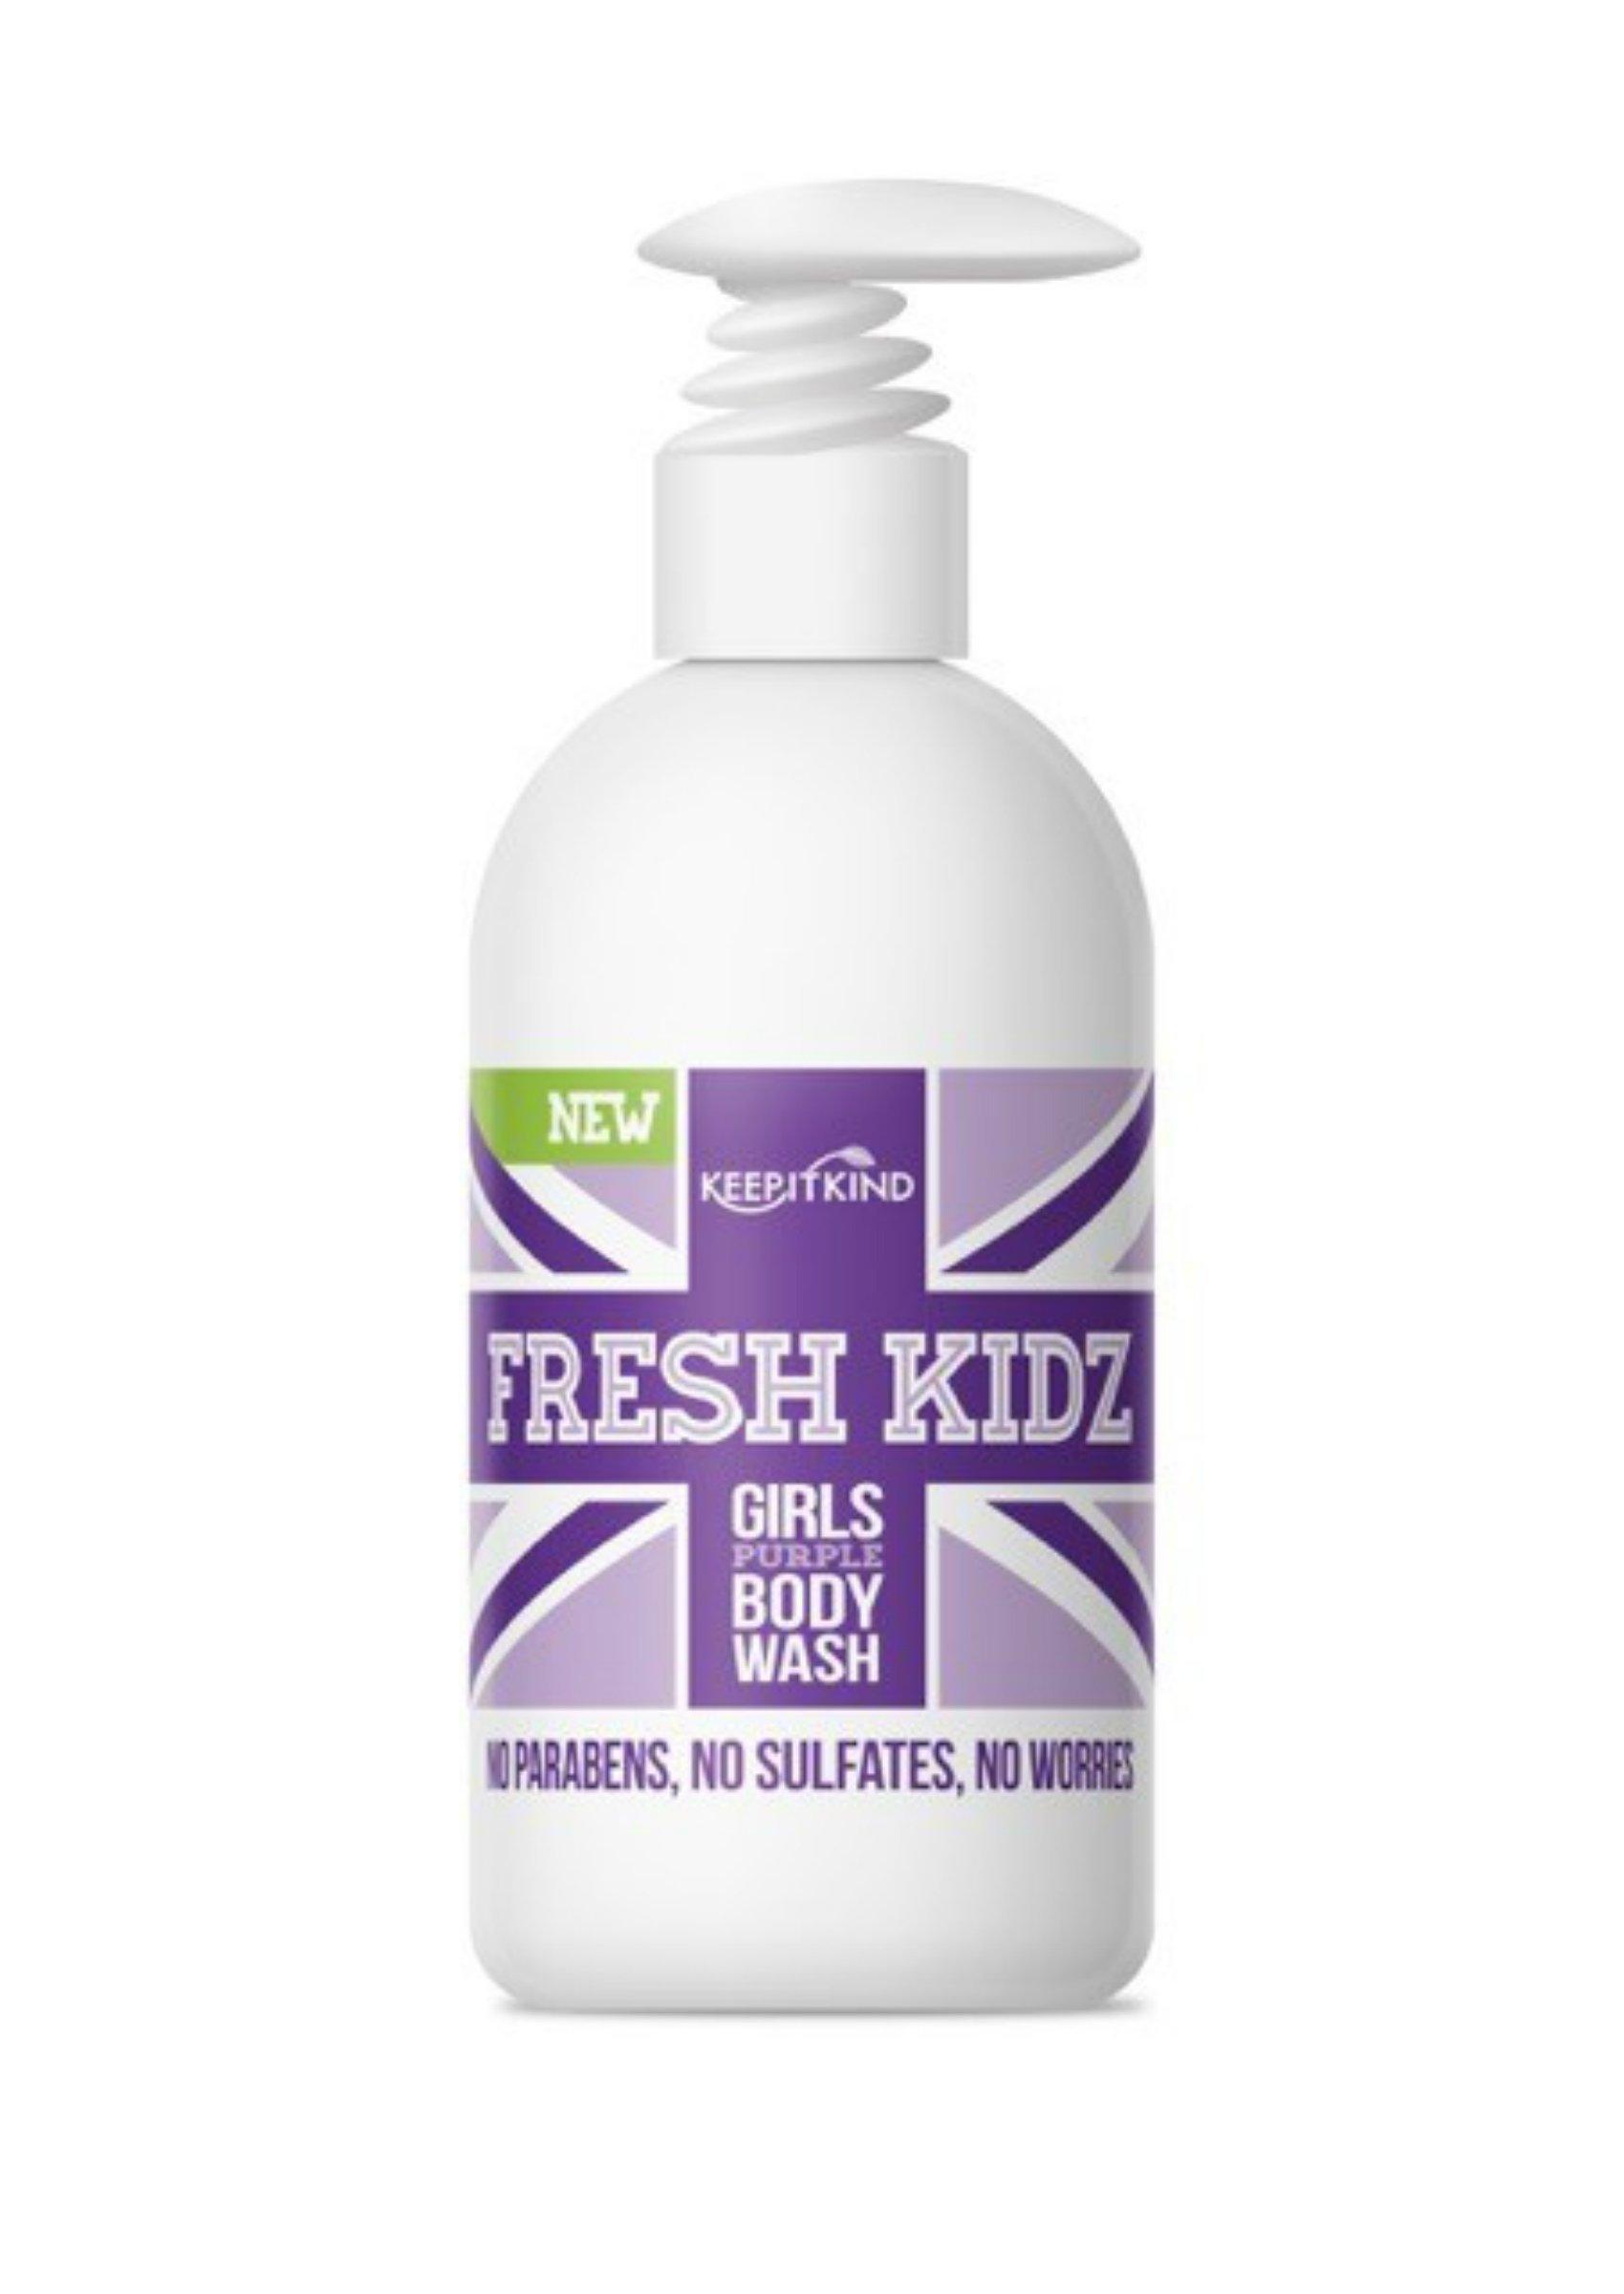 "Keep It Kind Fresh Kidz Natural Body Wash - Girls""Purple"", 16.9 fl.oz."